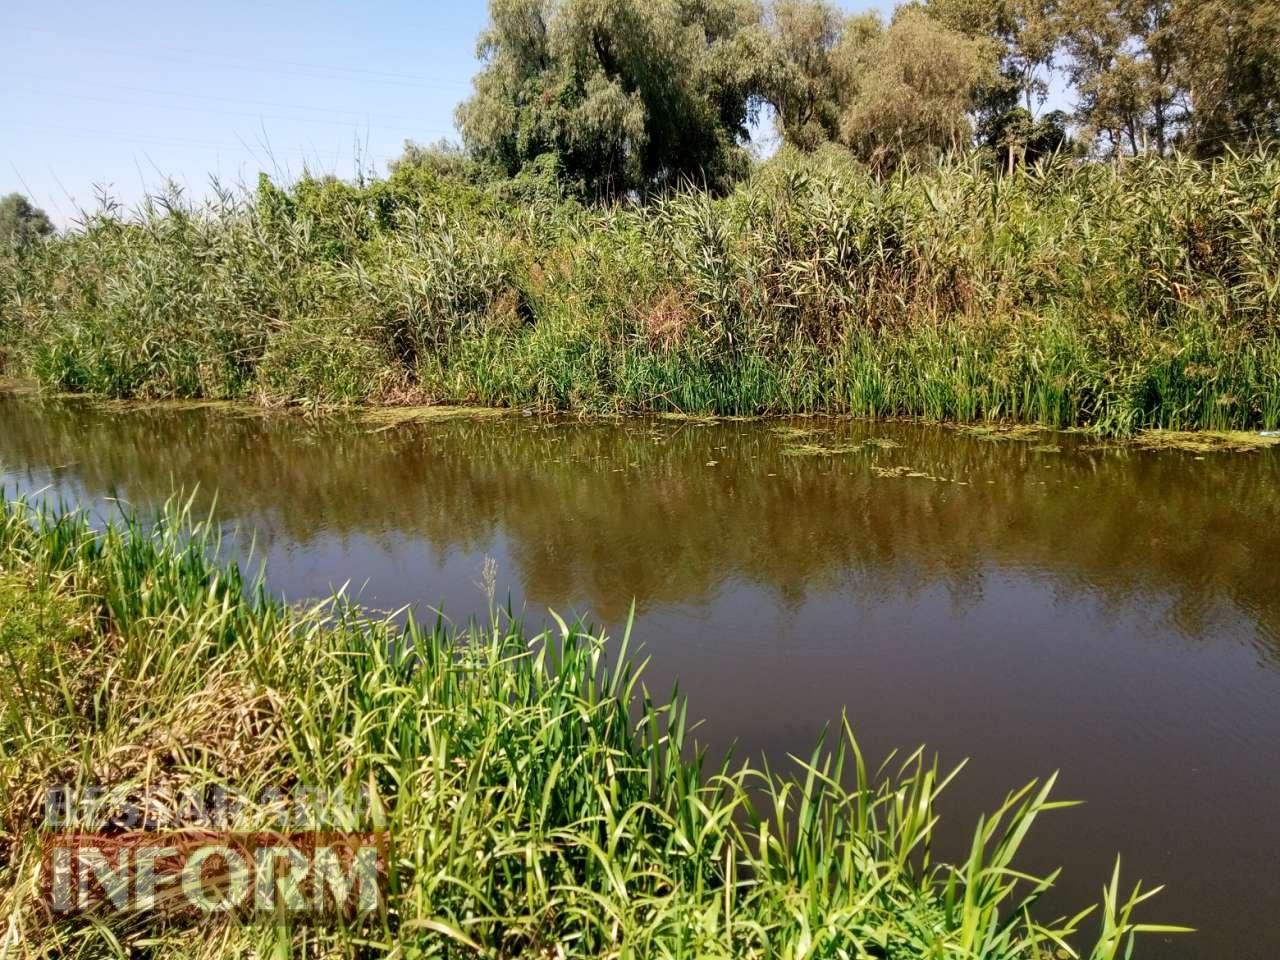 59830e8a8a2b8_aapaoa Канал Общественный в Измаильском районе: неужели расчистят?